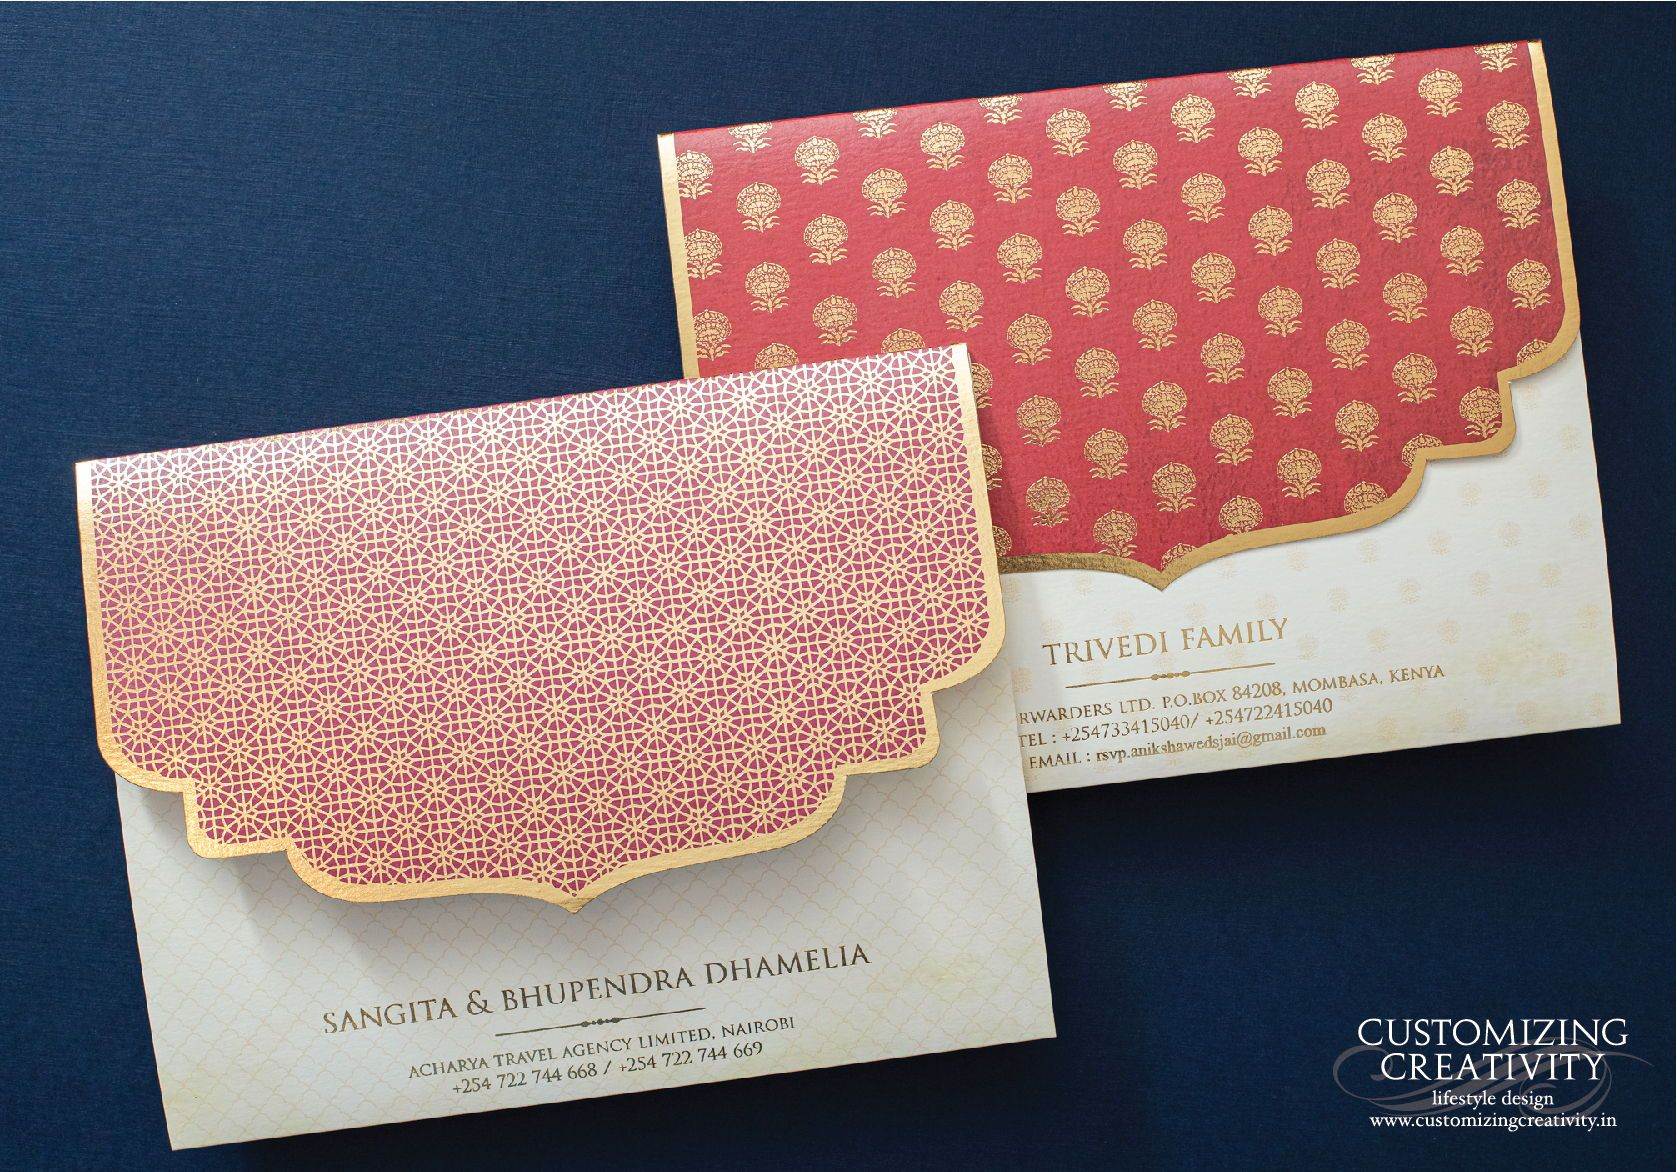 Wedding Invitation Cards Indian Wedding Cards Invites Wedding Stationery E Invite E Invitation Wedding Invitation Cards Indian Wedding Cards Wedding Cards